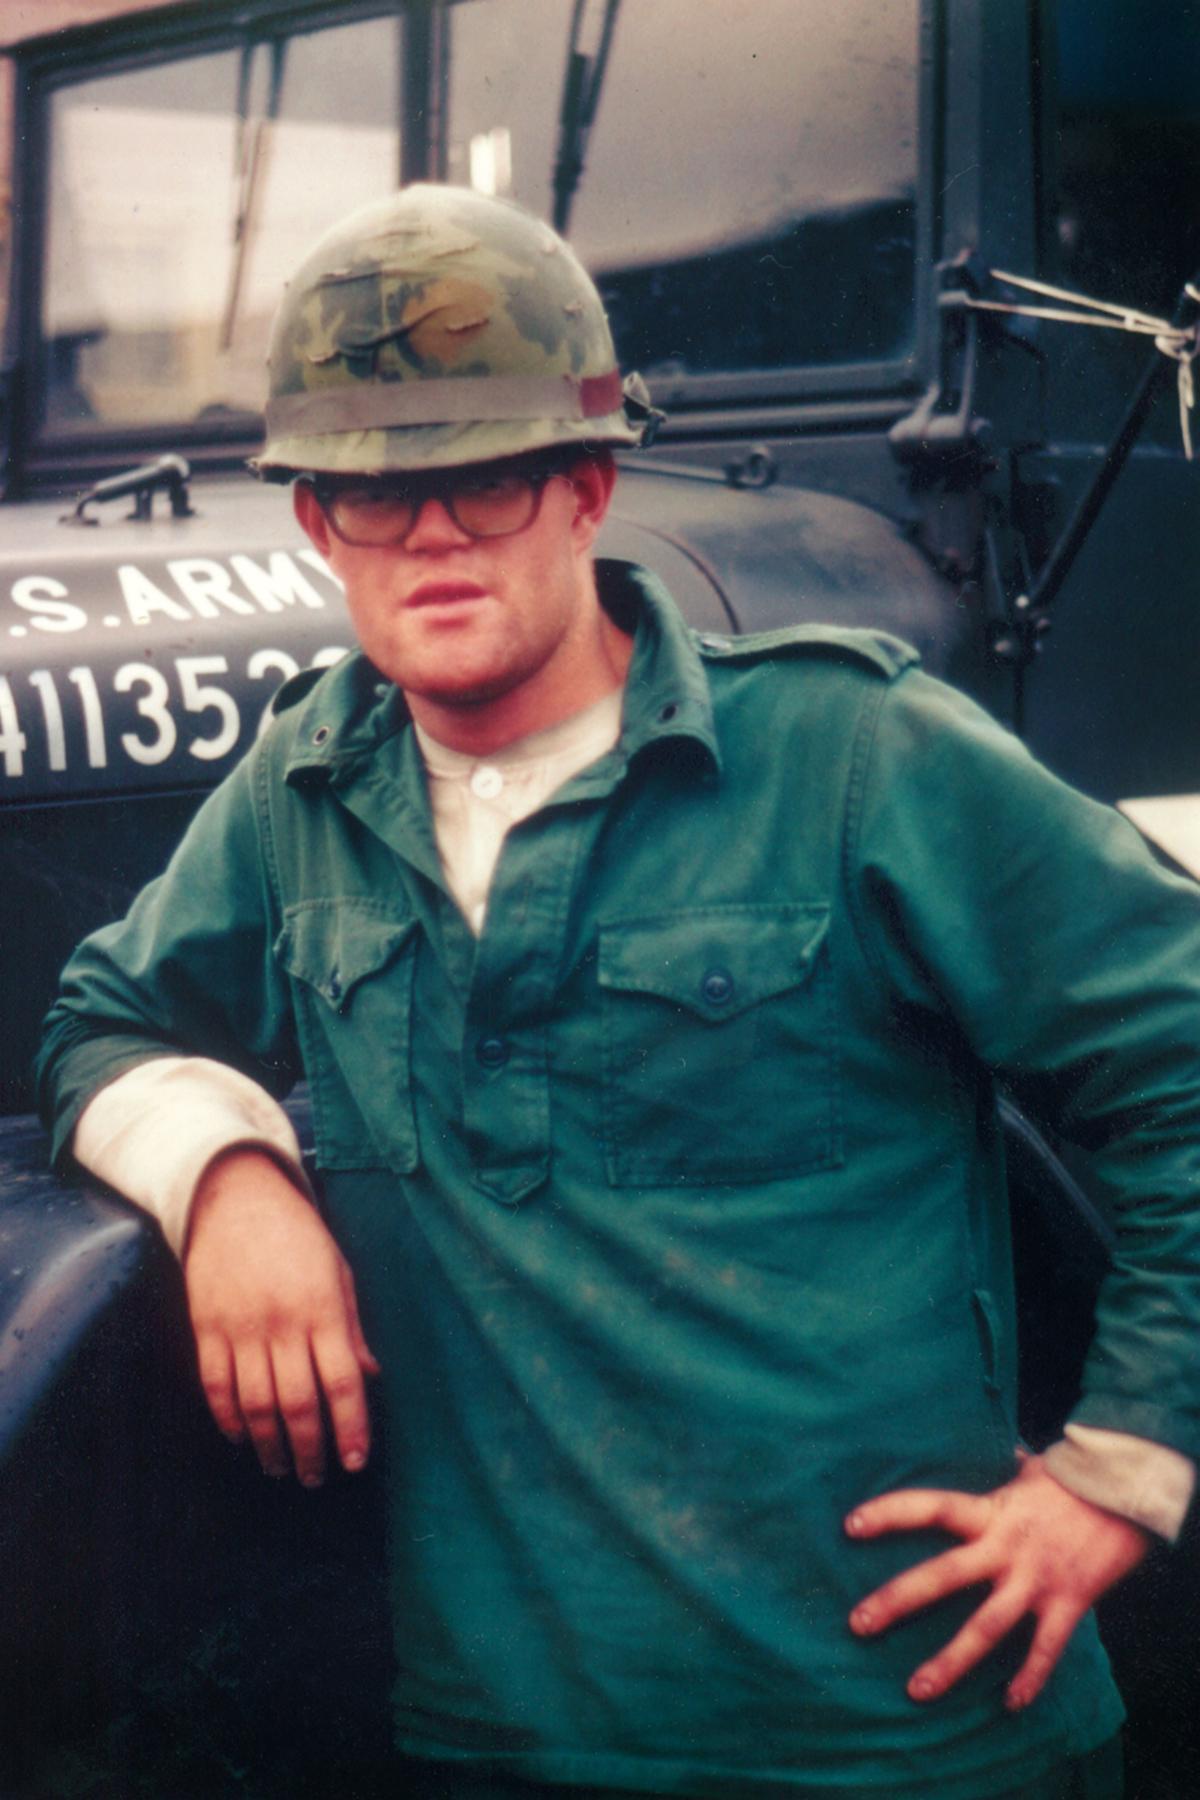 'A time of intensive living:' Vietnam veteran's ex-wife finally gets his posthumous war memoir into print